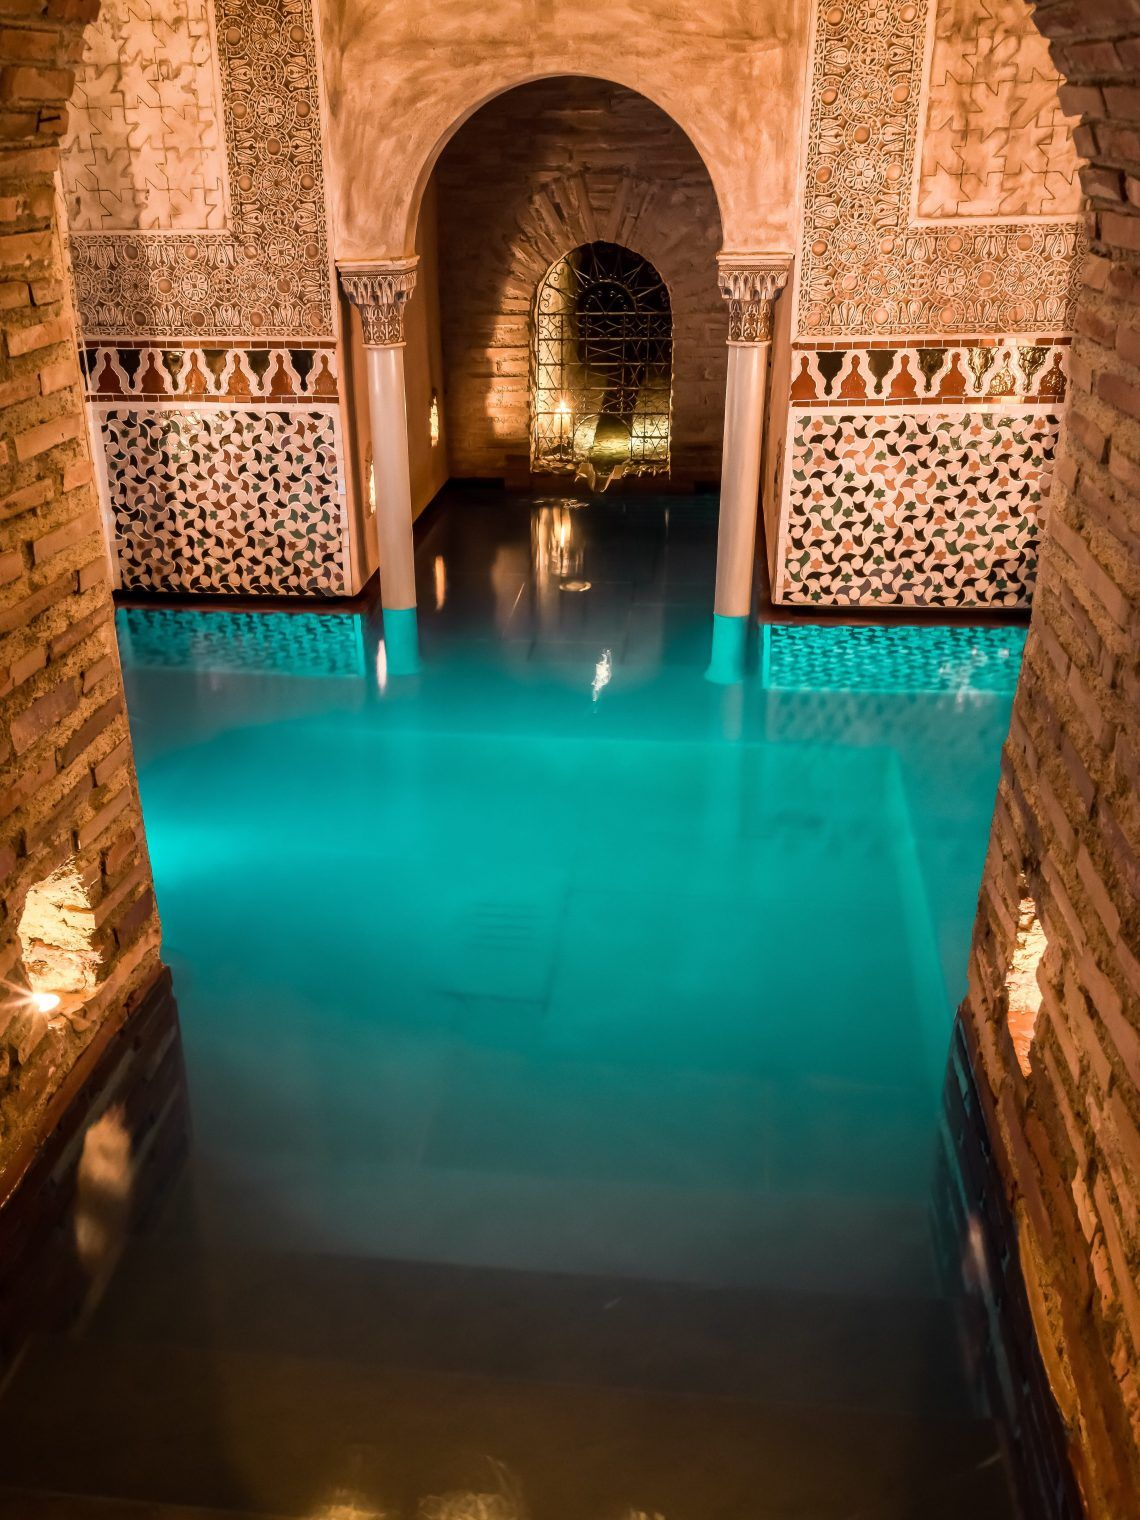 Unique Arab Baths Experience In Granada Hammam Al Andalus Barcelona Spa Al Andalus Turkish Bath House